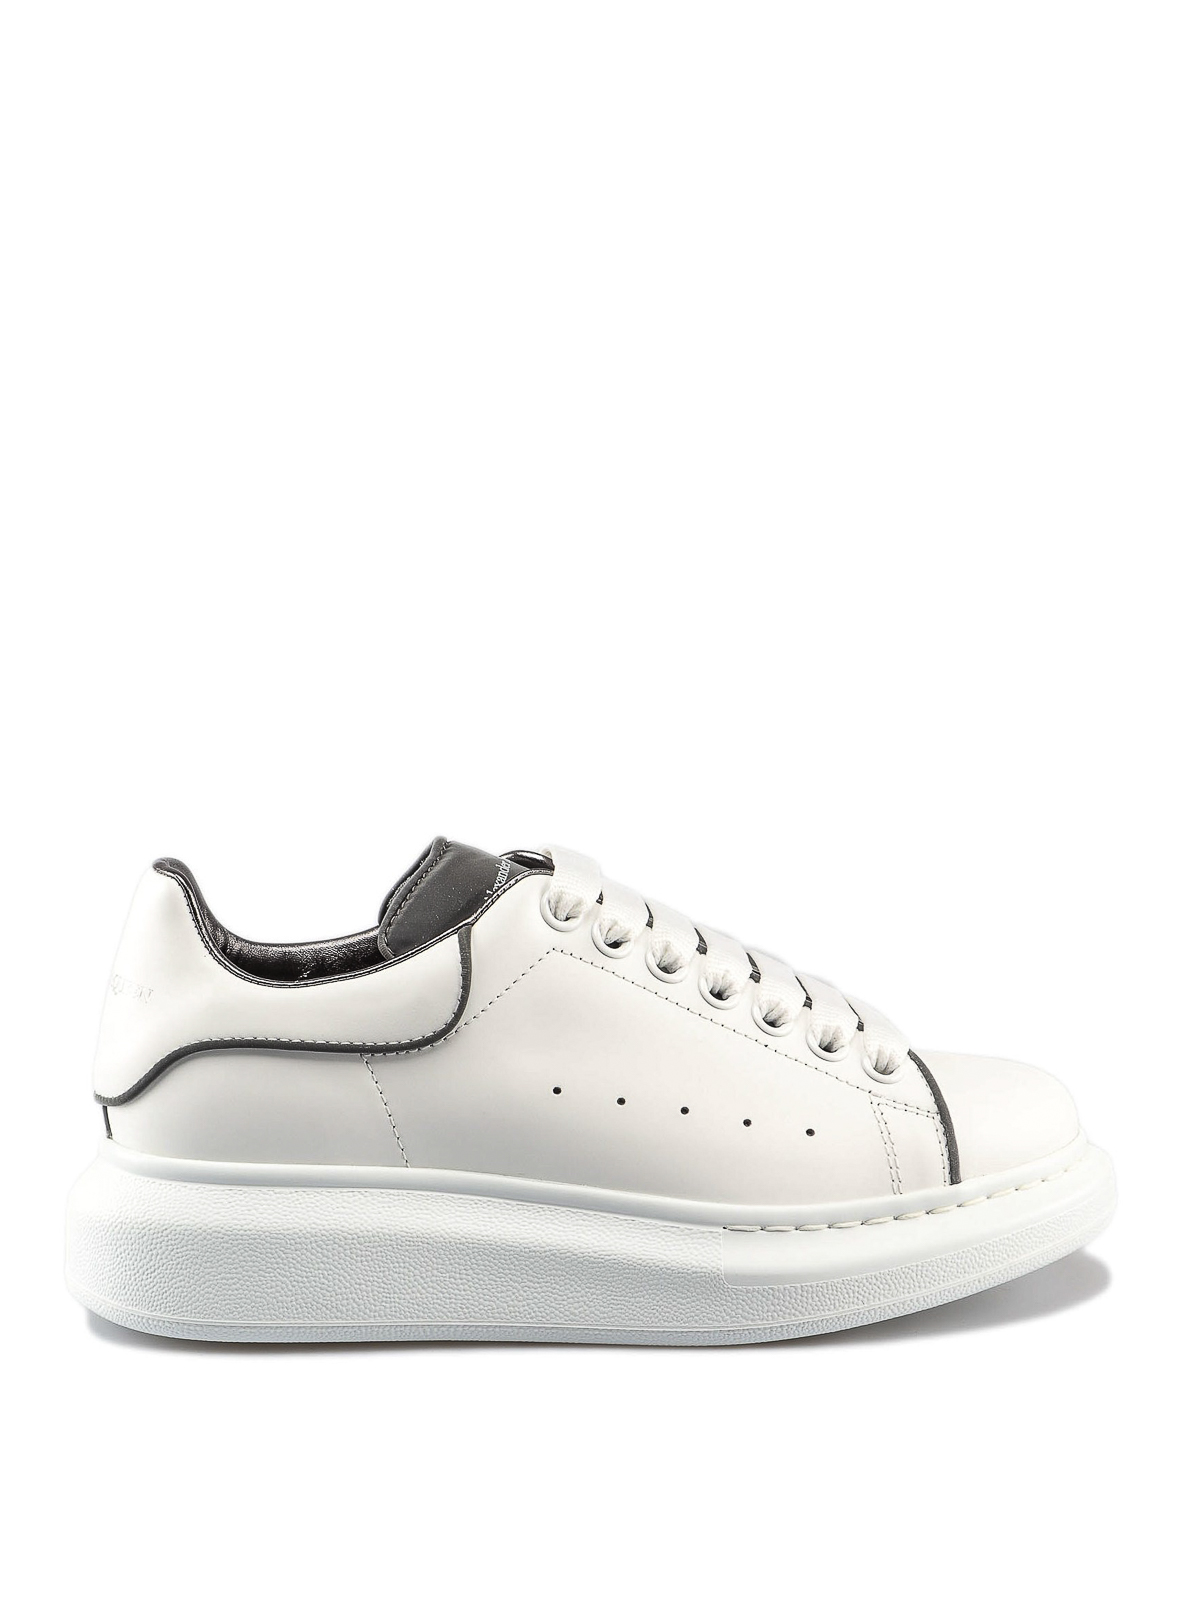 Alexander Mcqueen - Sneaker Oversize con inserti ...